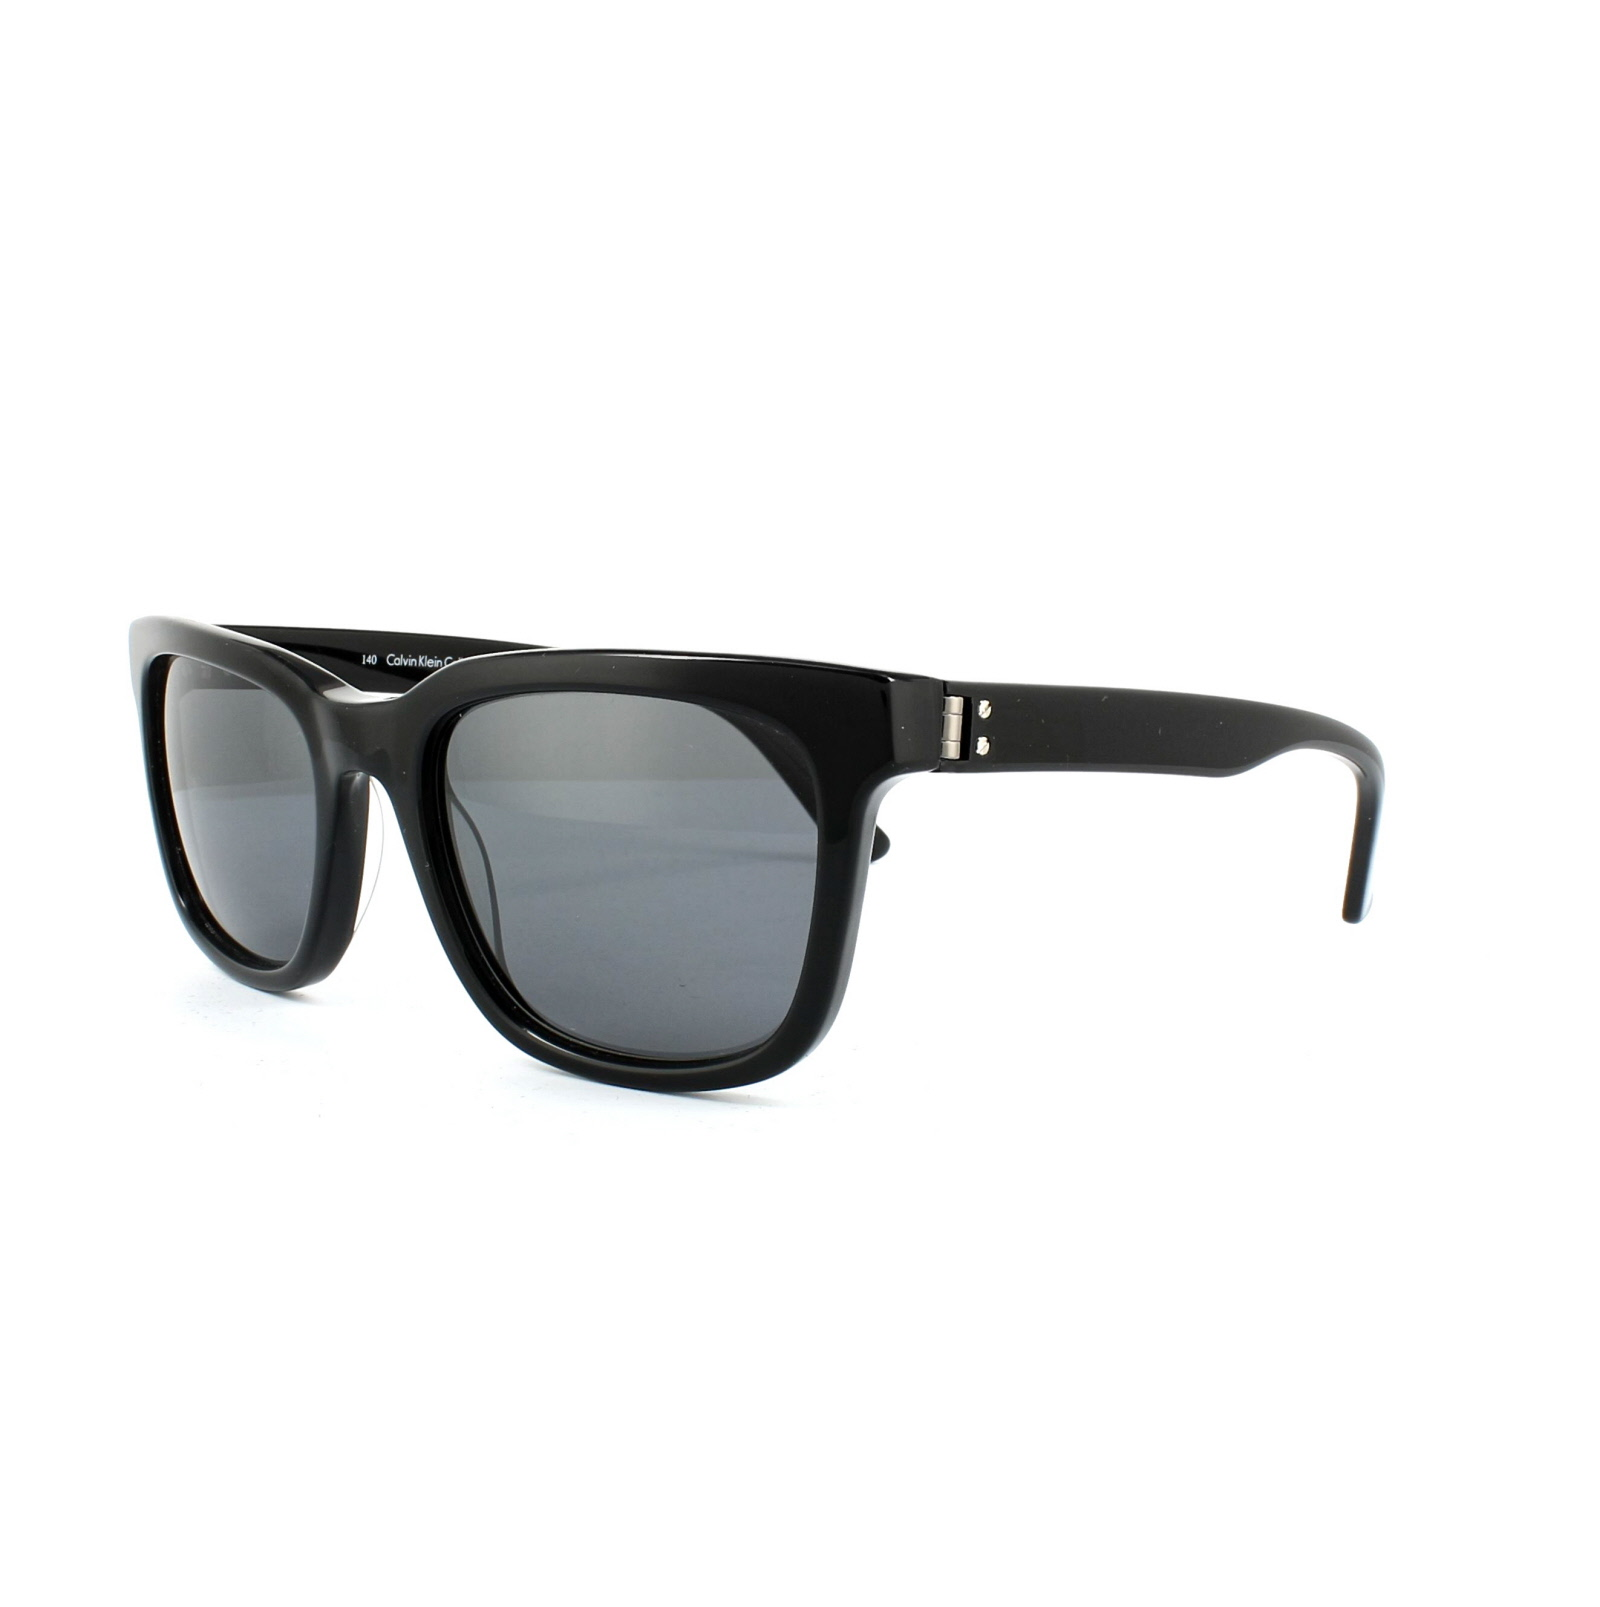 5802cc01b10 Sentinel Calvin Klein Sunglasses CK7960SP 001 Black Grey Blue Polarized